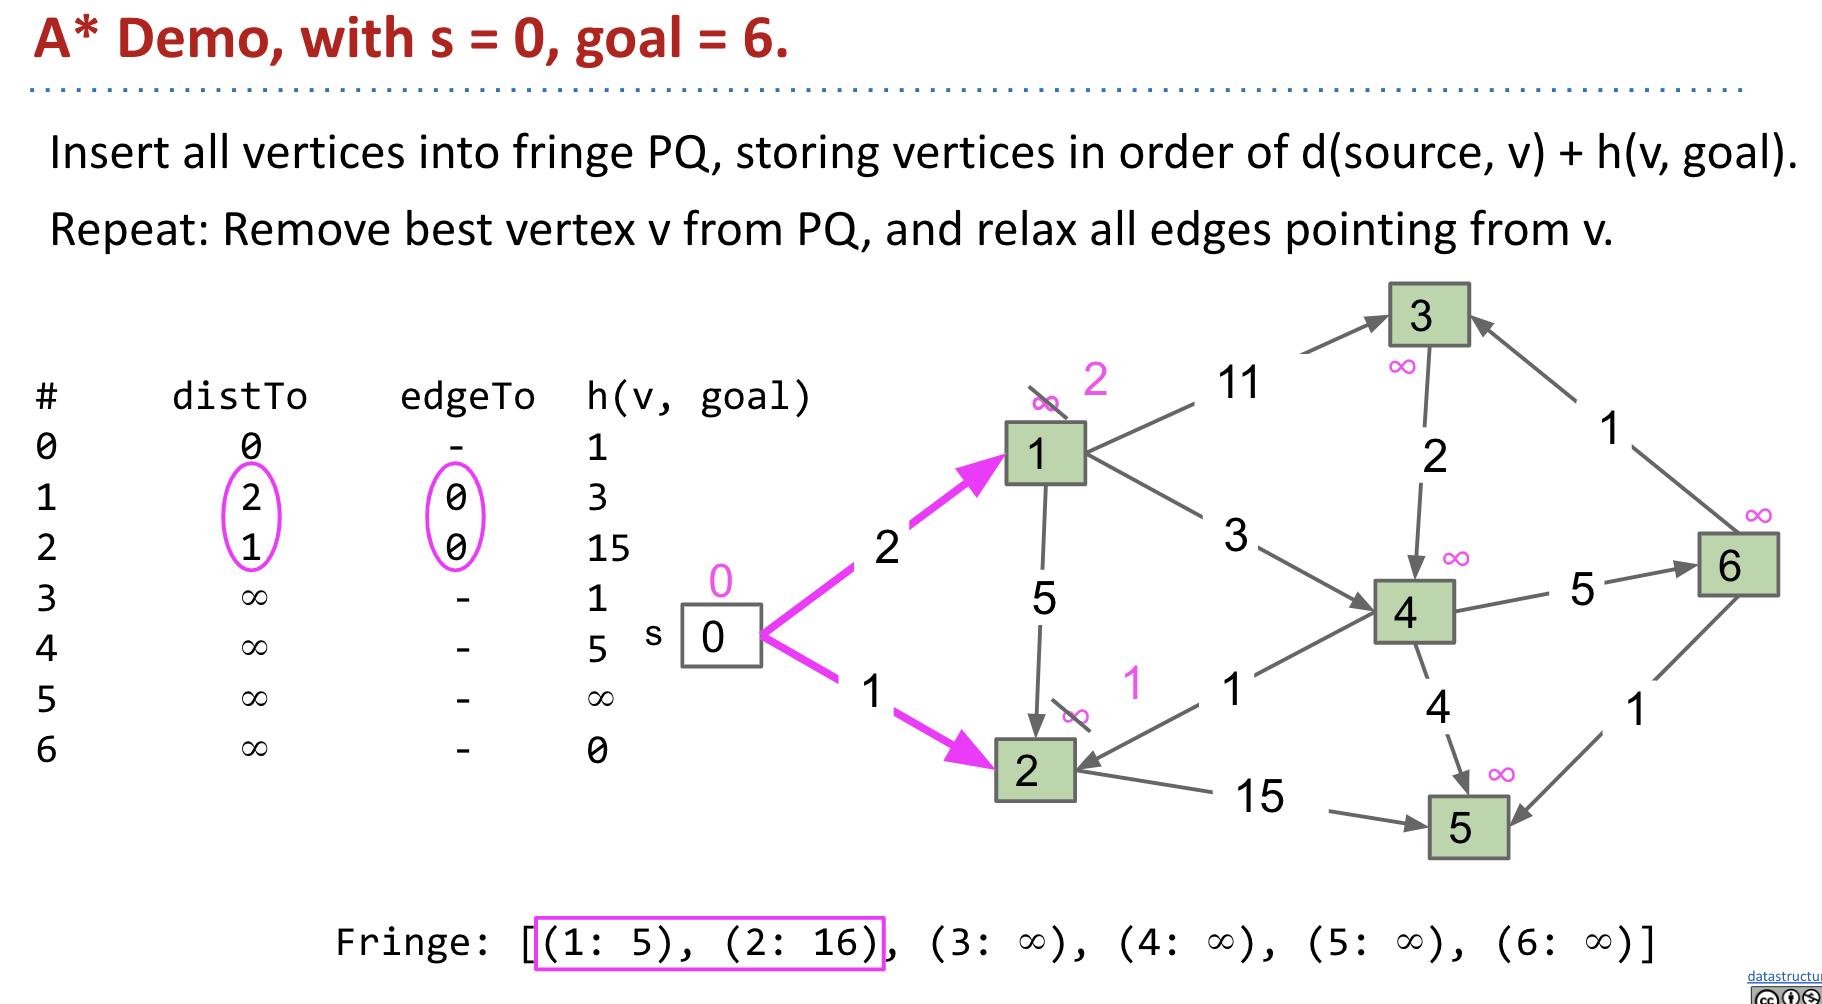 Go to vertex 1 or 2